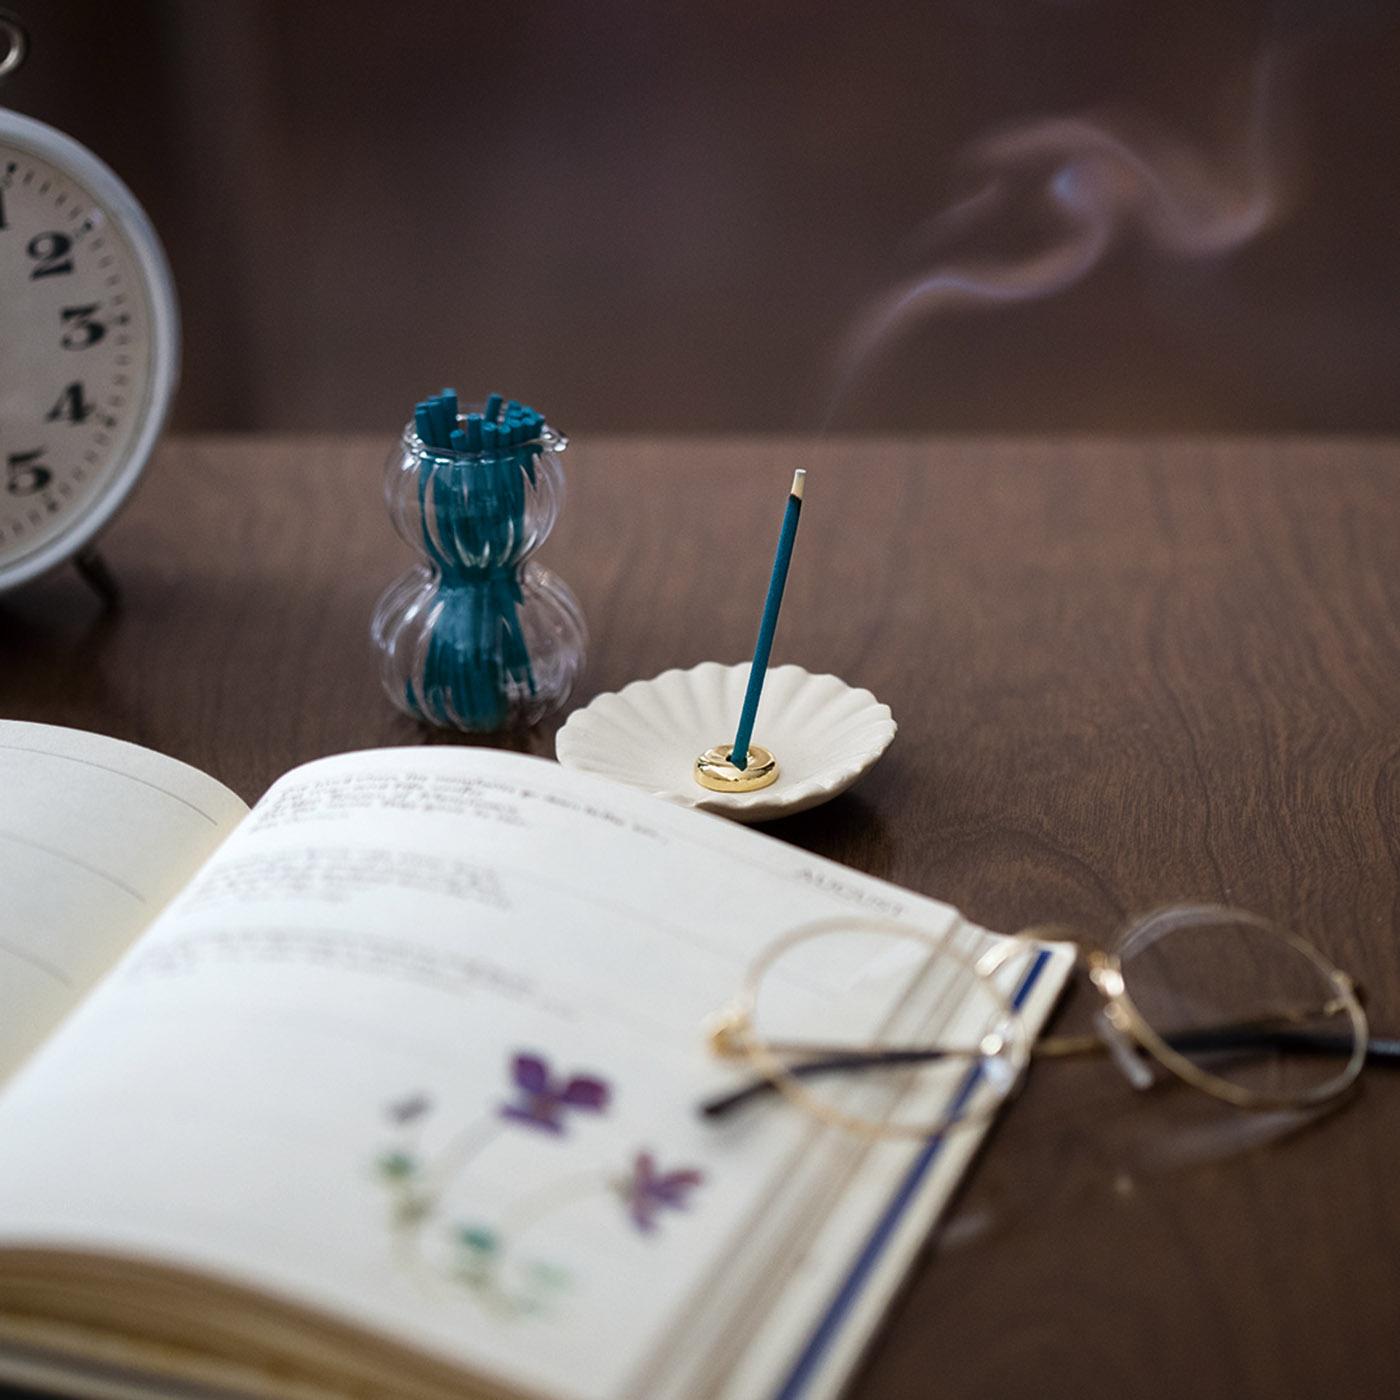 Kraso[クラソ] |ガラフル すきま時間に香り咲かせる スティック香セットの会|燃焼時間は約15分間。毎日の気分に合わせて焚いて、リラックスタイムをつくりましょう。